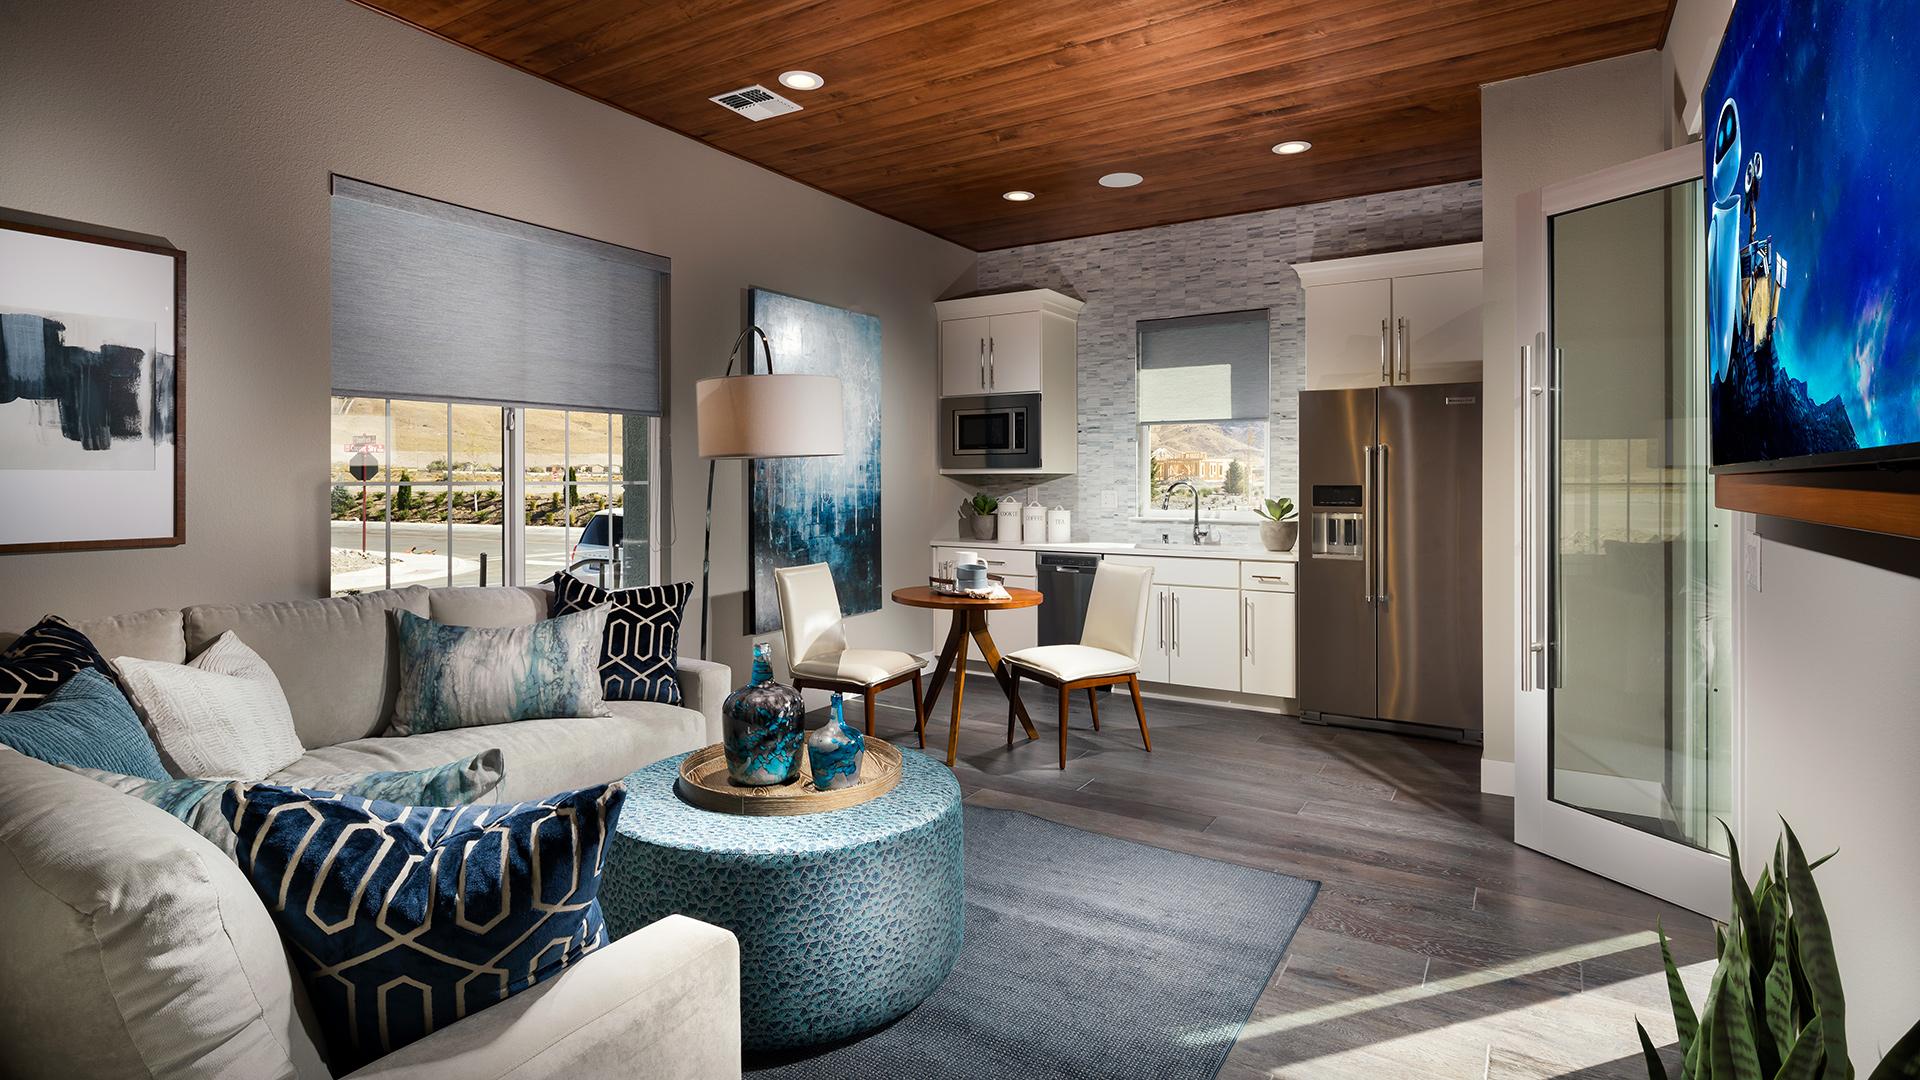 Sorrento trail at bella vista ranch the malta nv home - Home designer suite software reviews ...